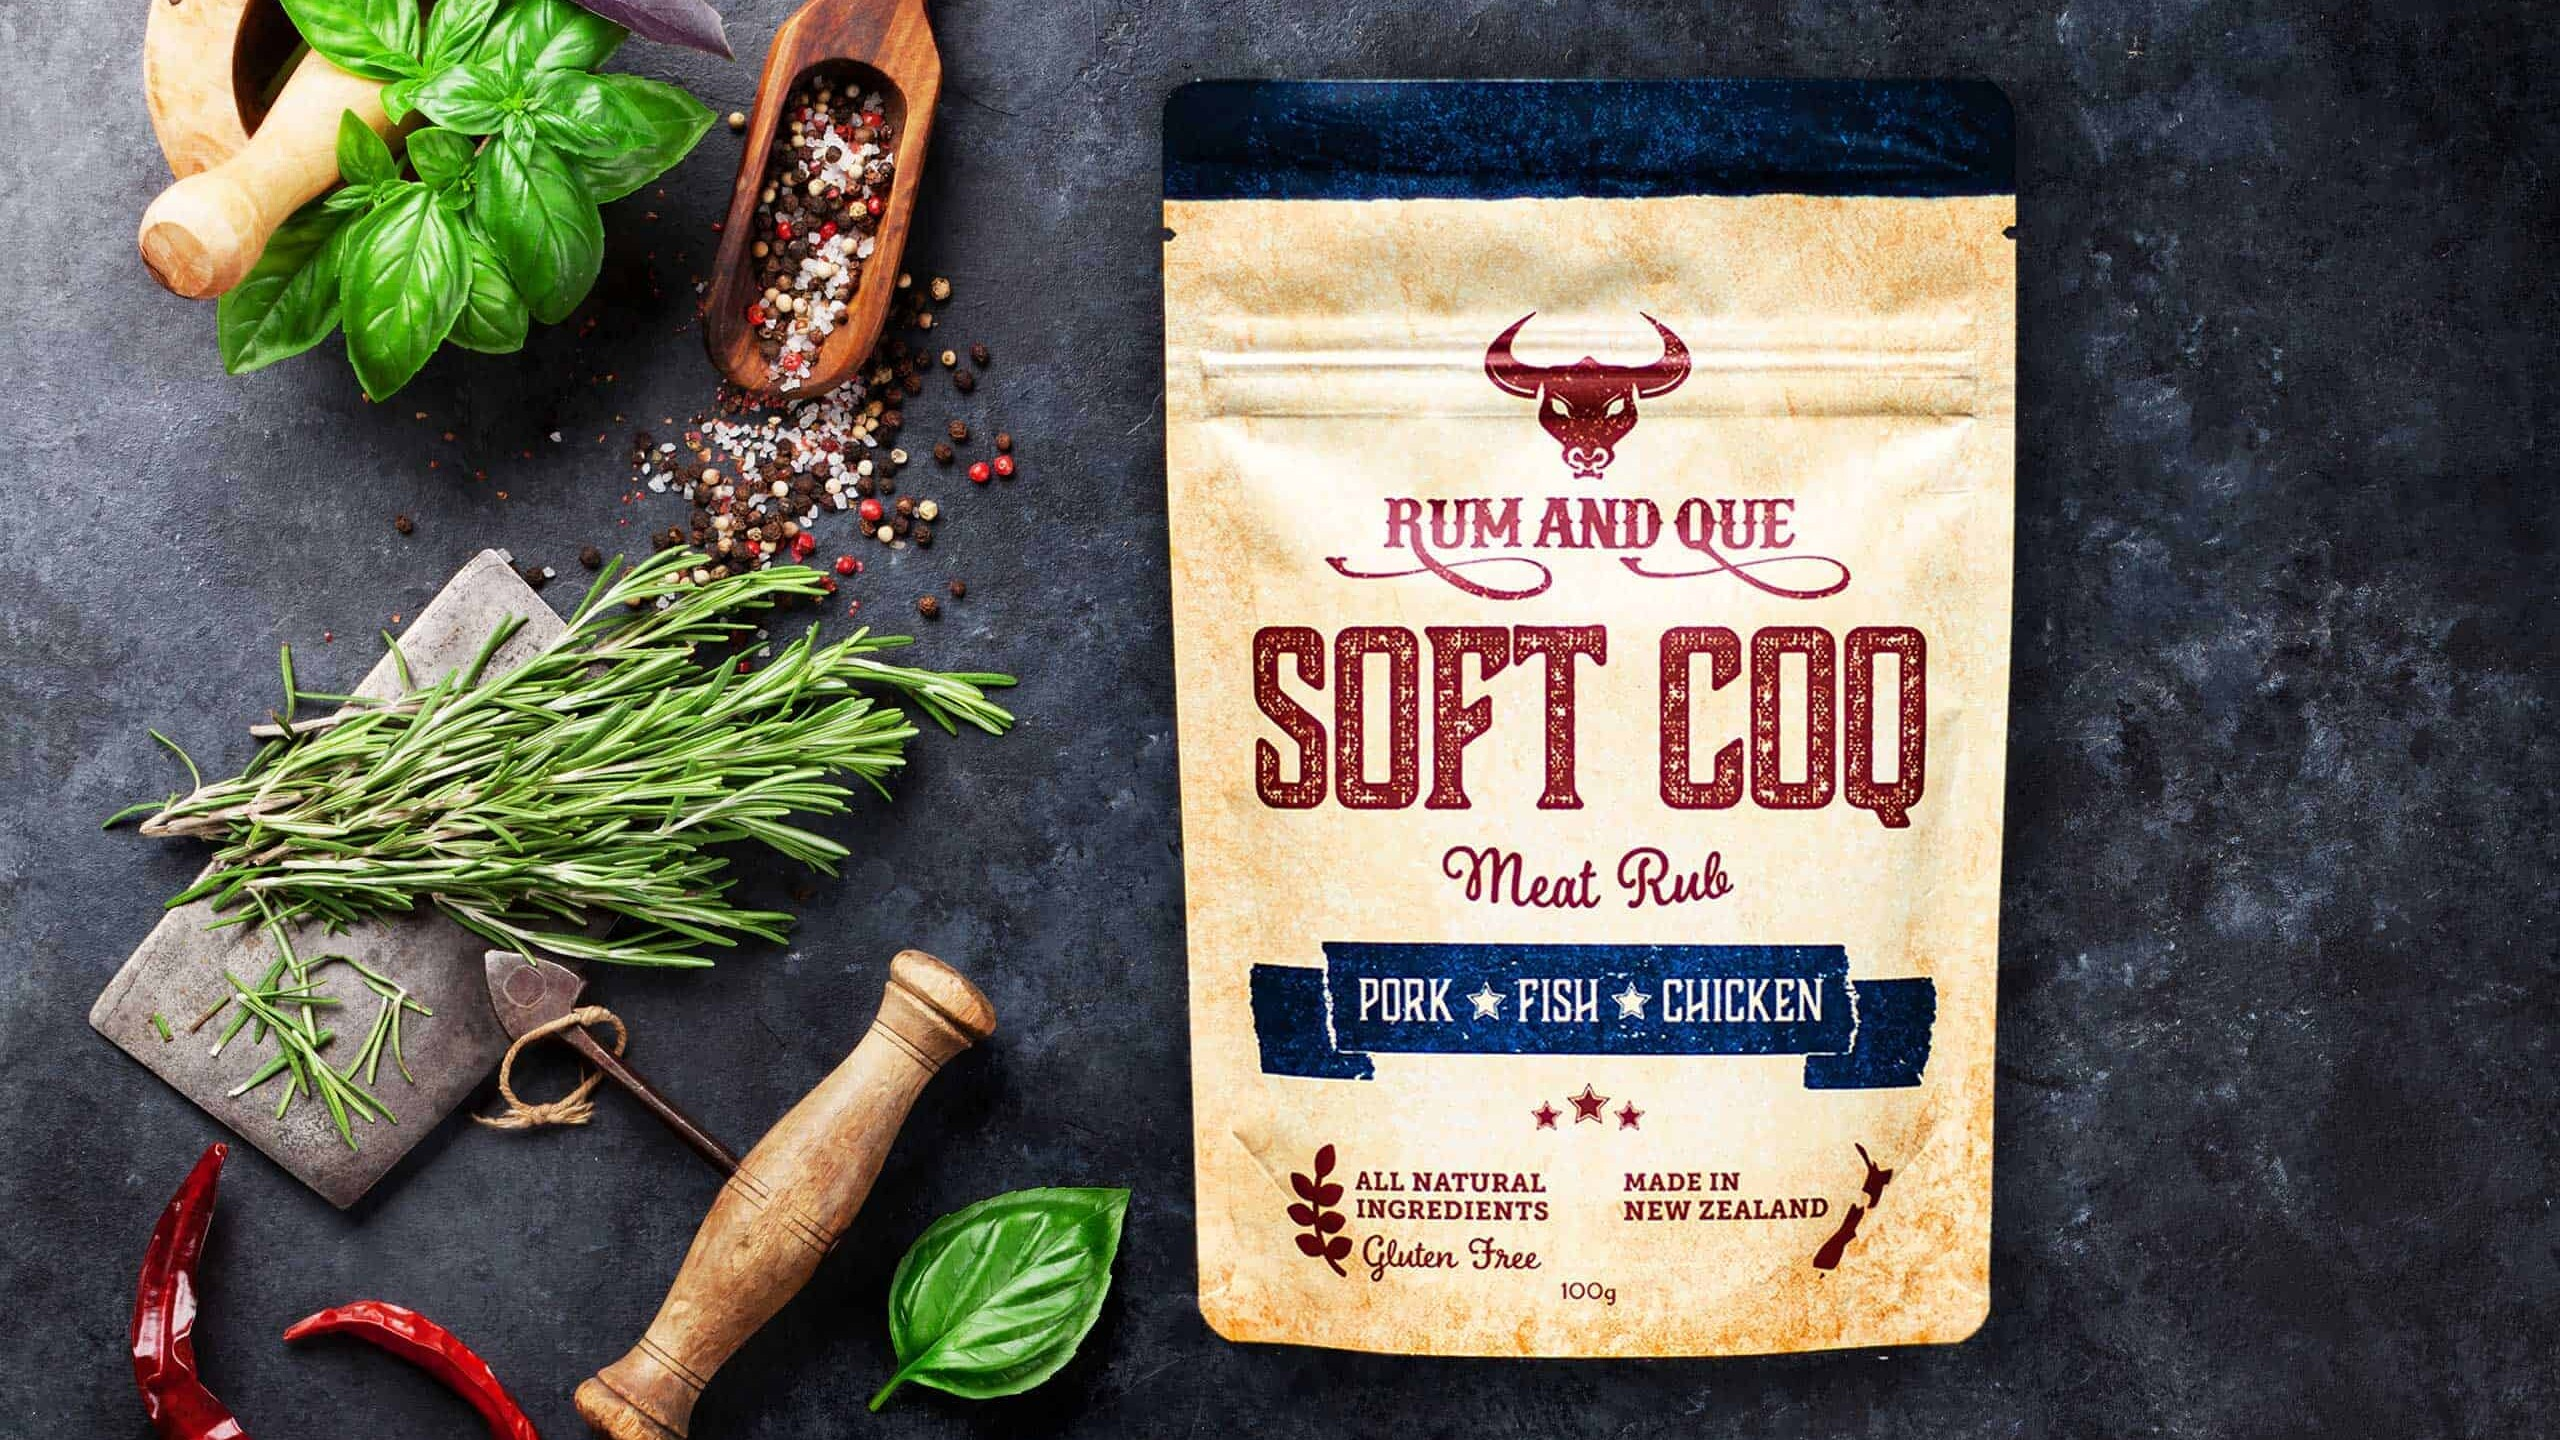 Rum & Que Soft Coq Meat Rub